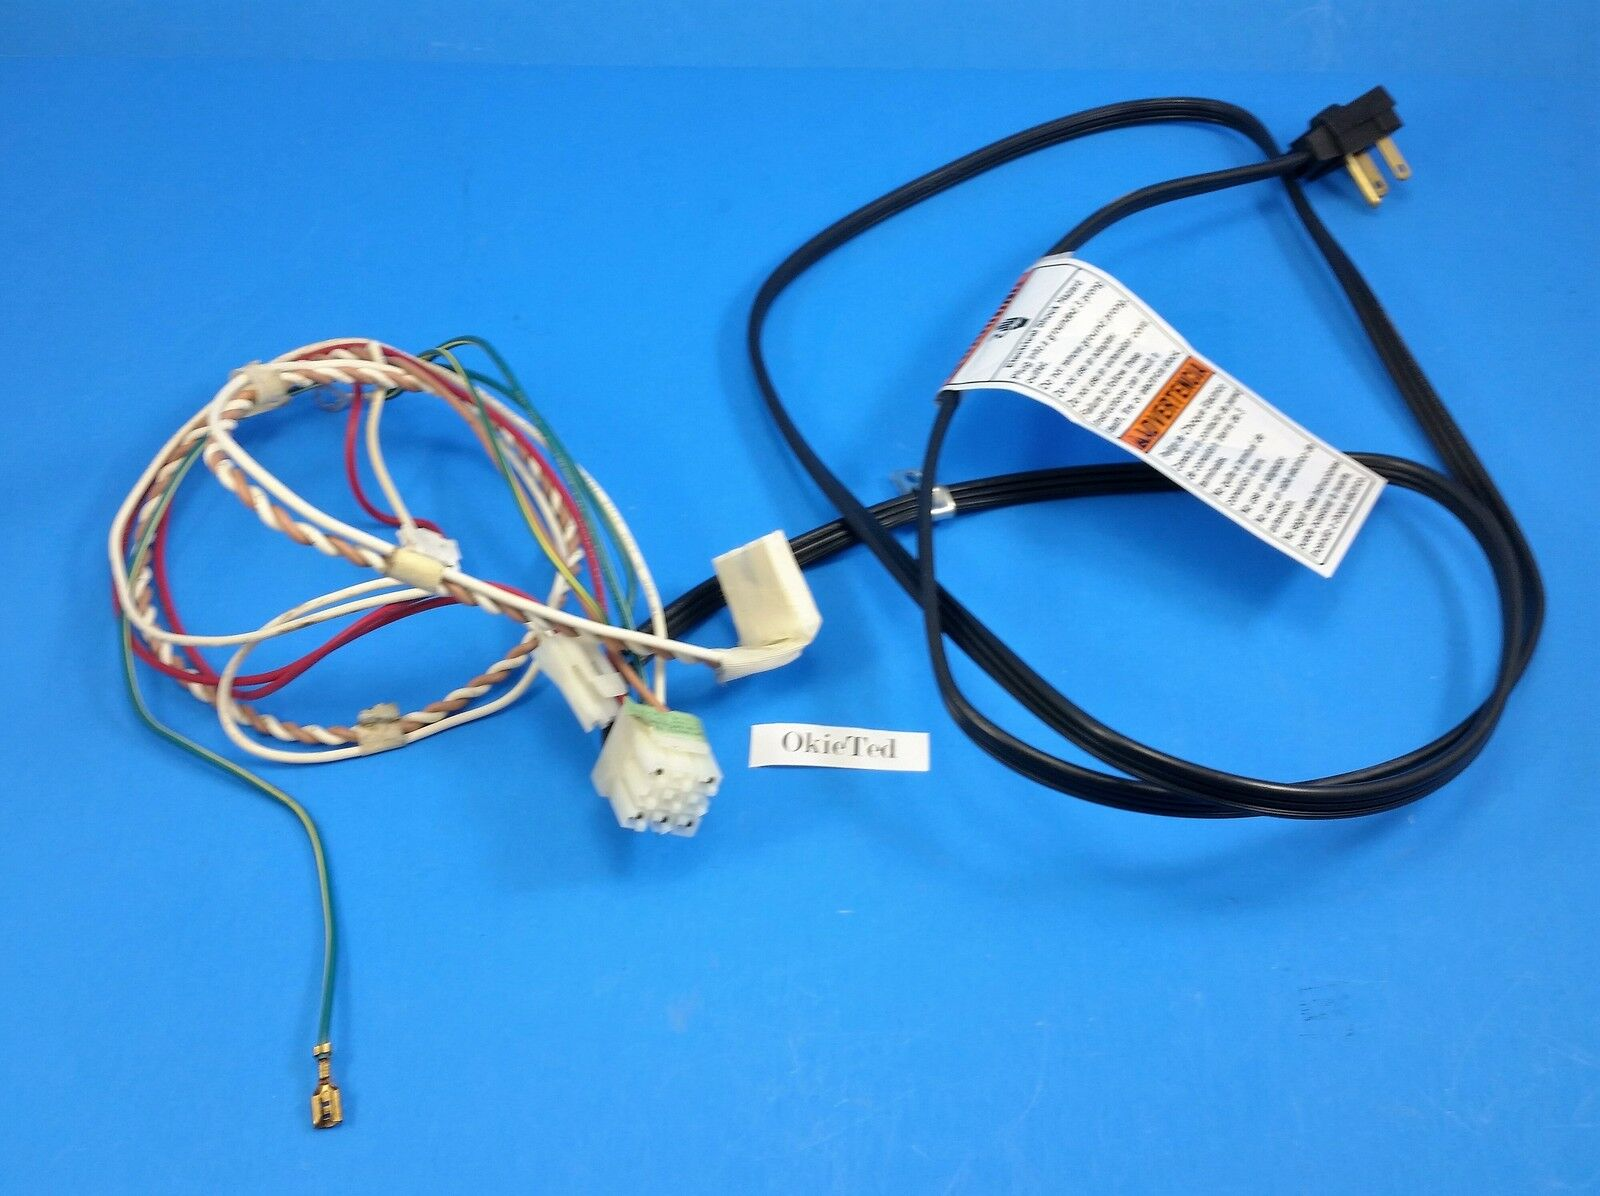 w10405935 whirlpool refrigerator power cord wire harness b3 5b you re almost done w10405935 whirlpool refrigerator power cord wire harness